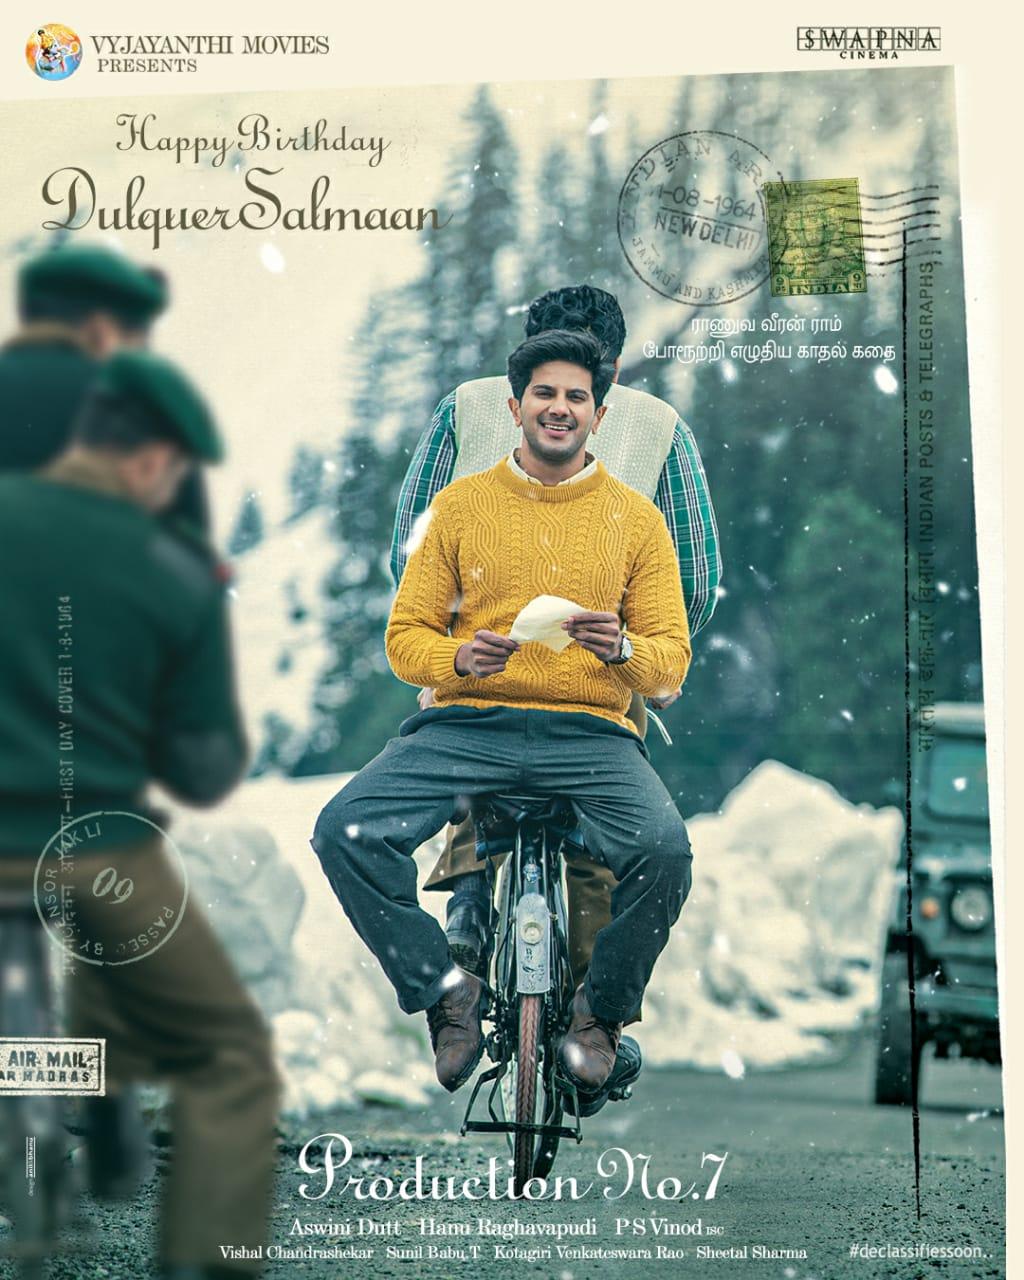 Dulquer Salman, Hanu Raghavapudi, Swapna Cinema, Vyjayanthi Movies- Birthday Glimpse Of 'Lieutenant' RAM Unveiled